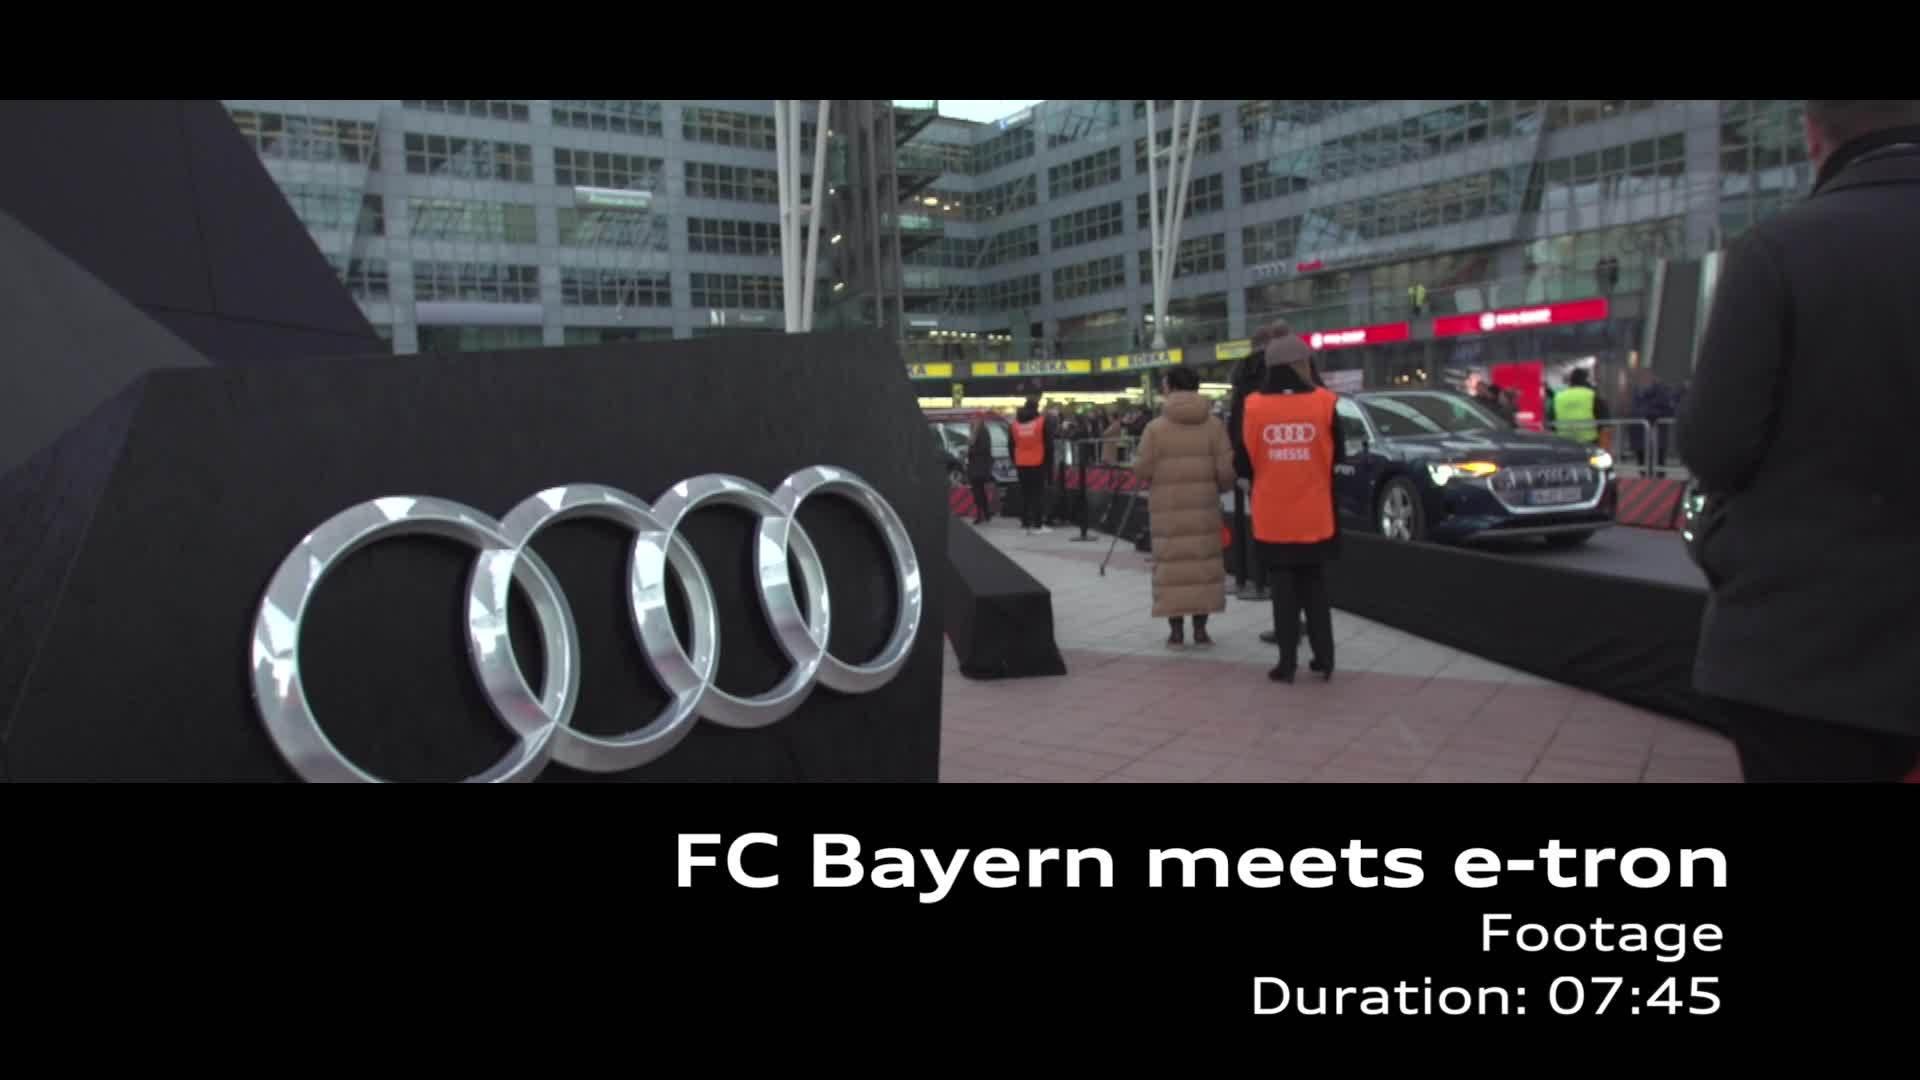 FC Bayern meets Audi e-tron (Footage)